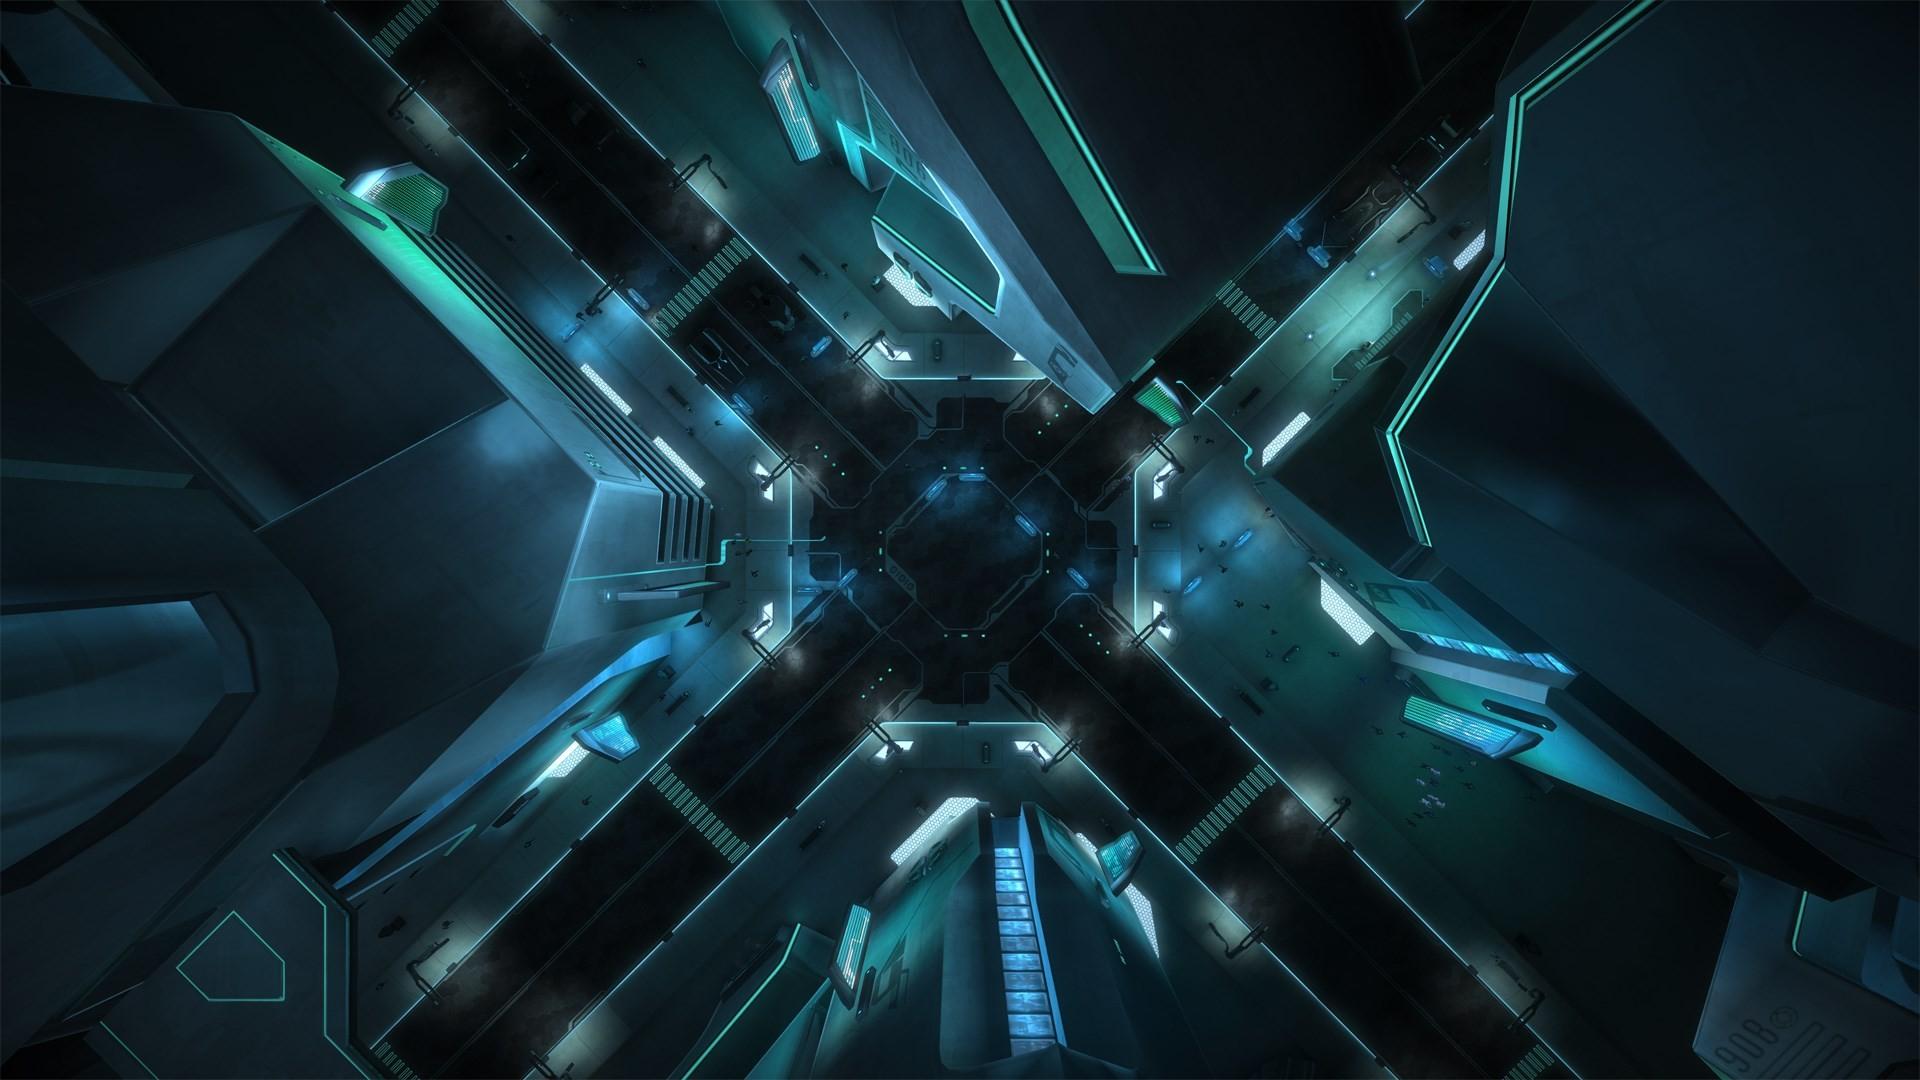 tron backgrounds images (Graeme Blare 1920×1080)